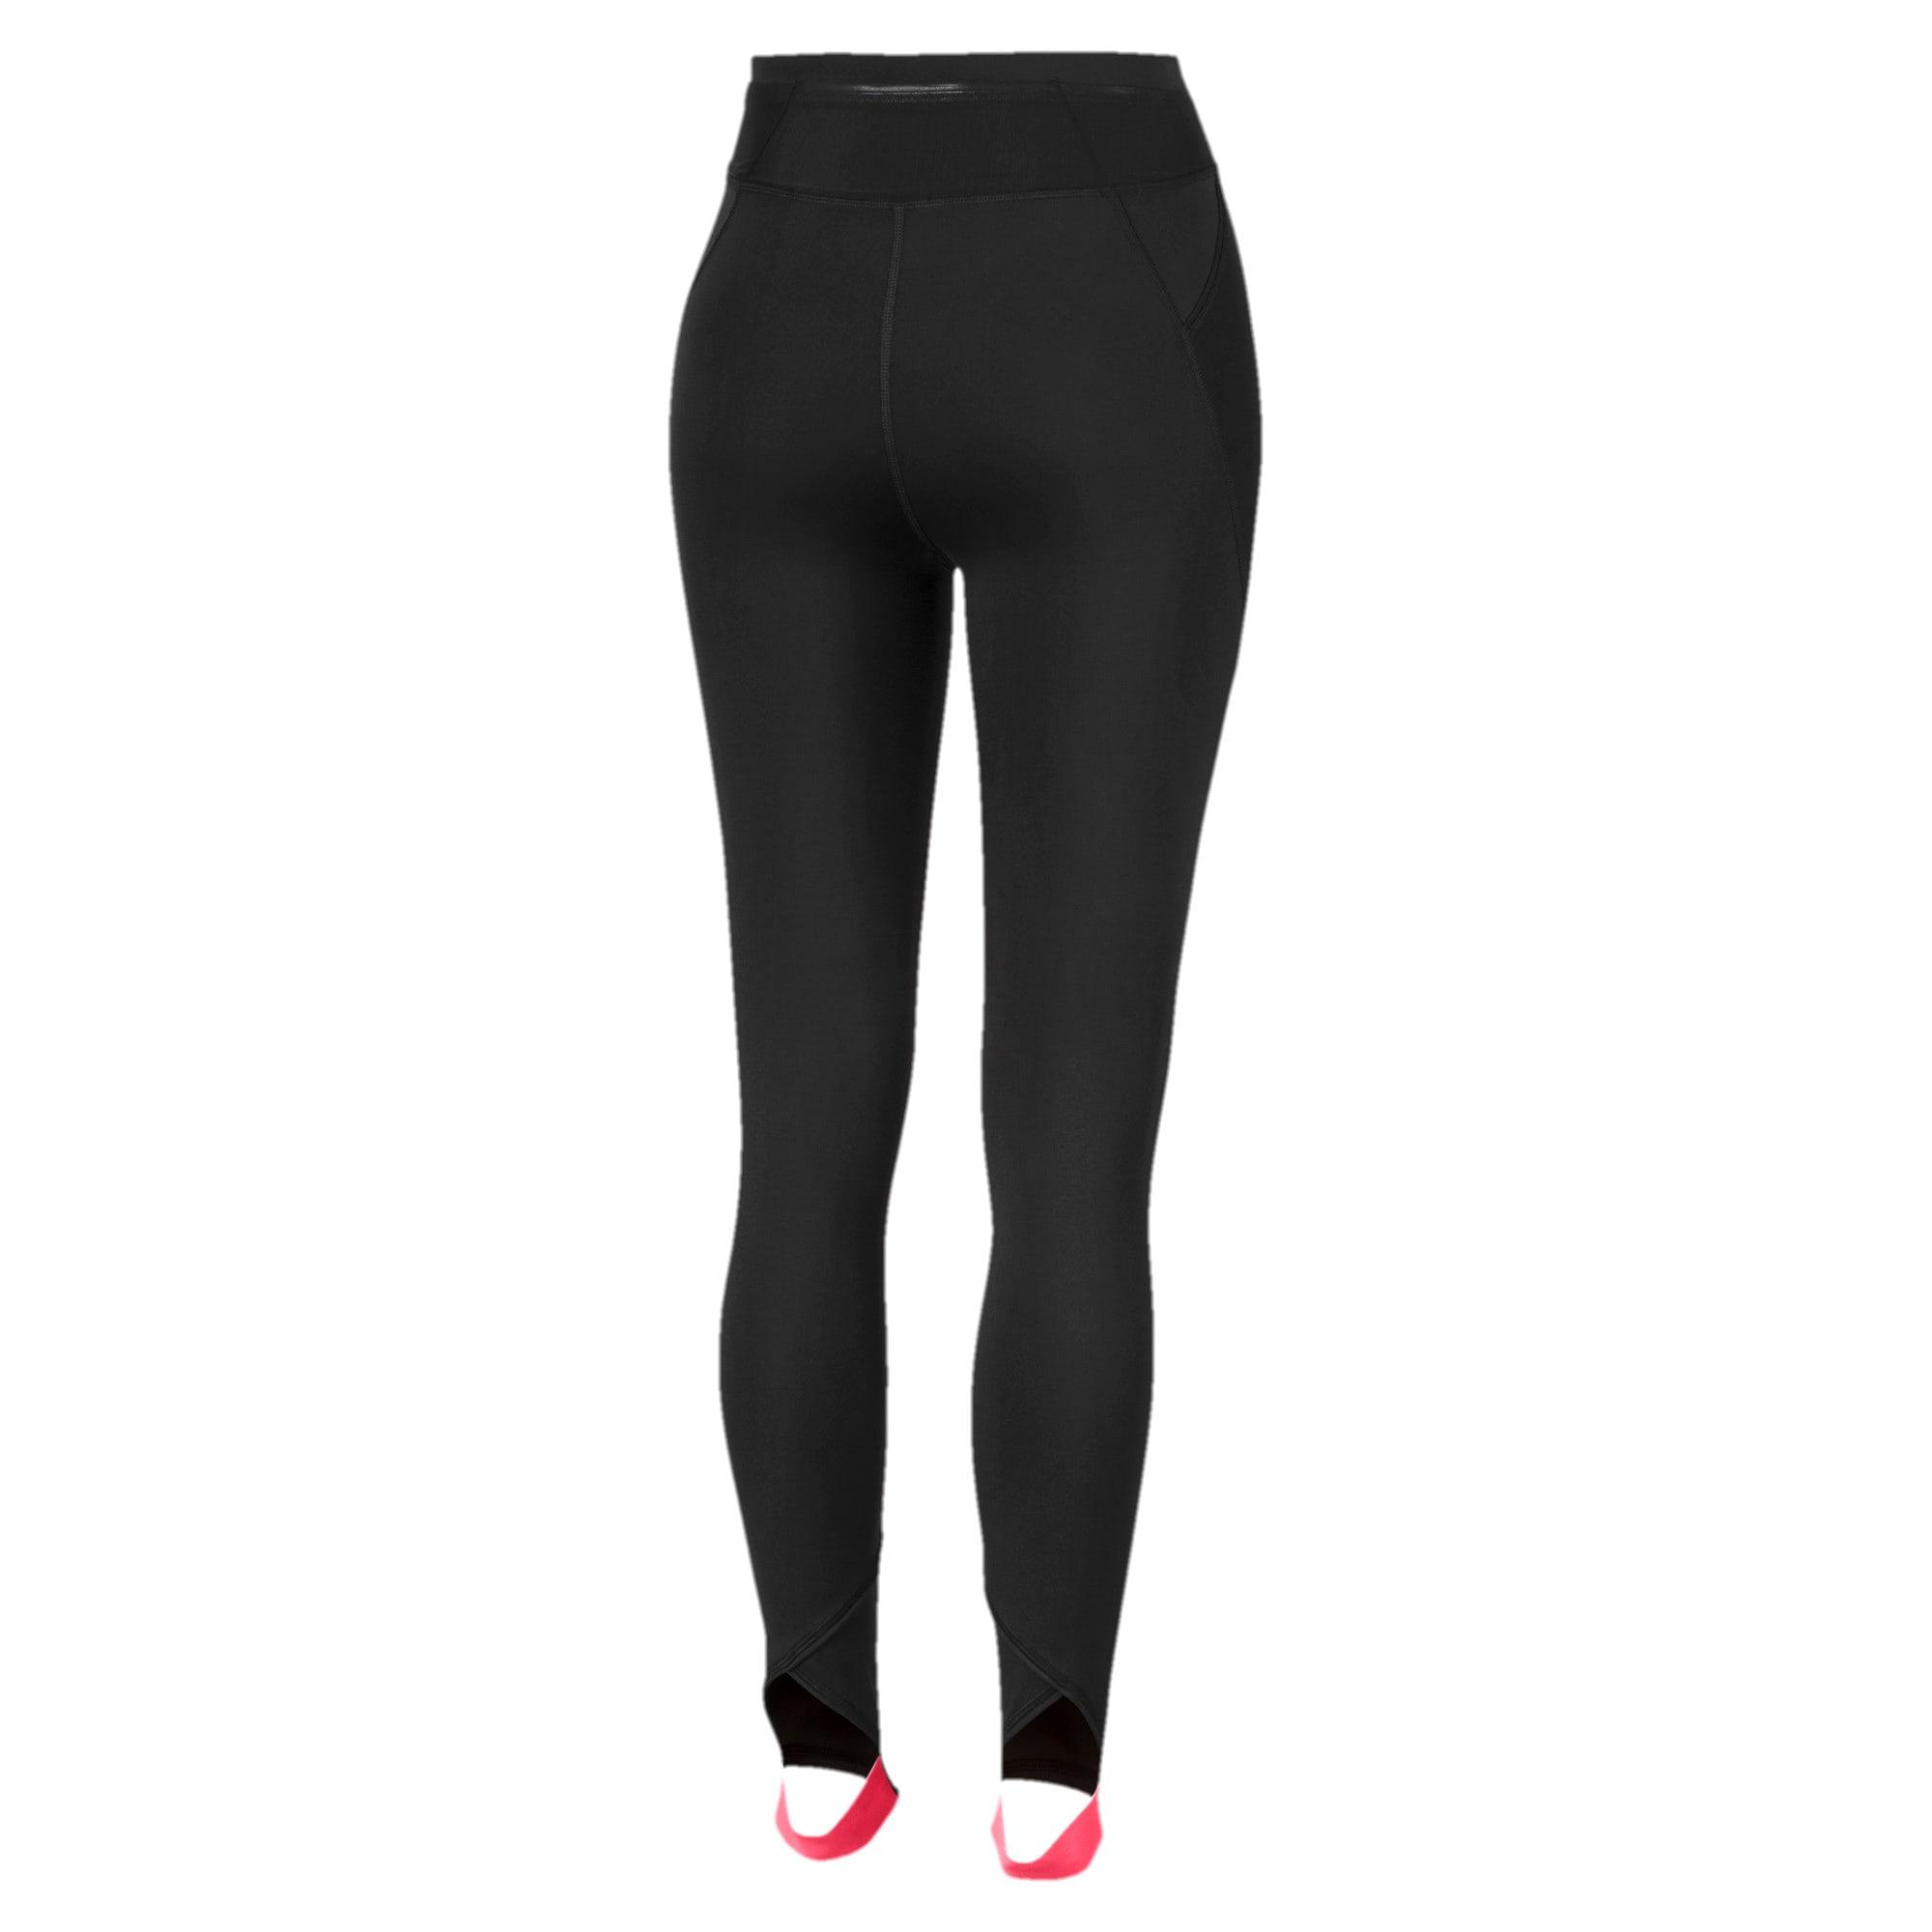 Thumbnail 5 of HIT Feel It 7/8 Women's Training Leggings, Puma Black-Pink Alert, medium